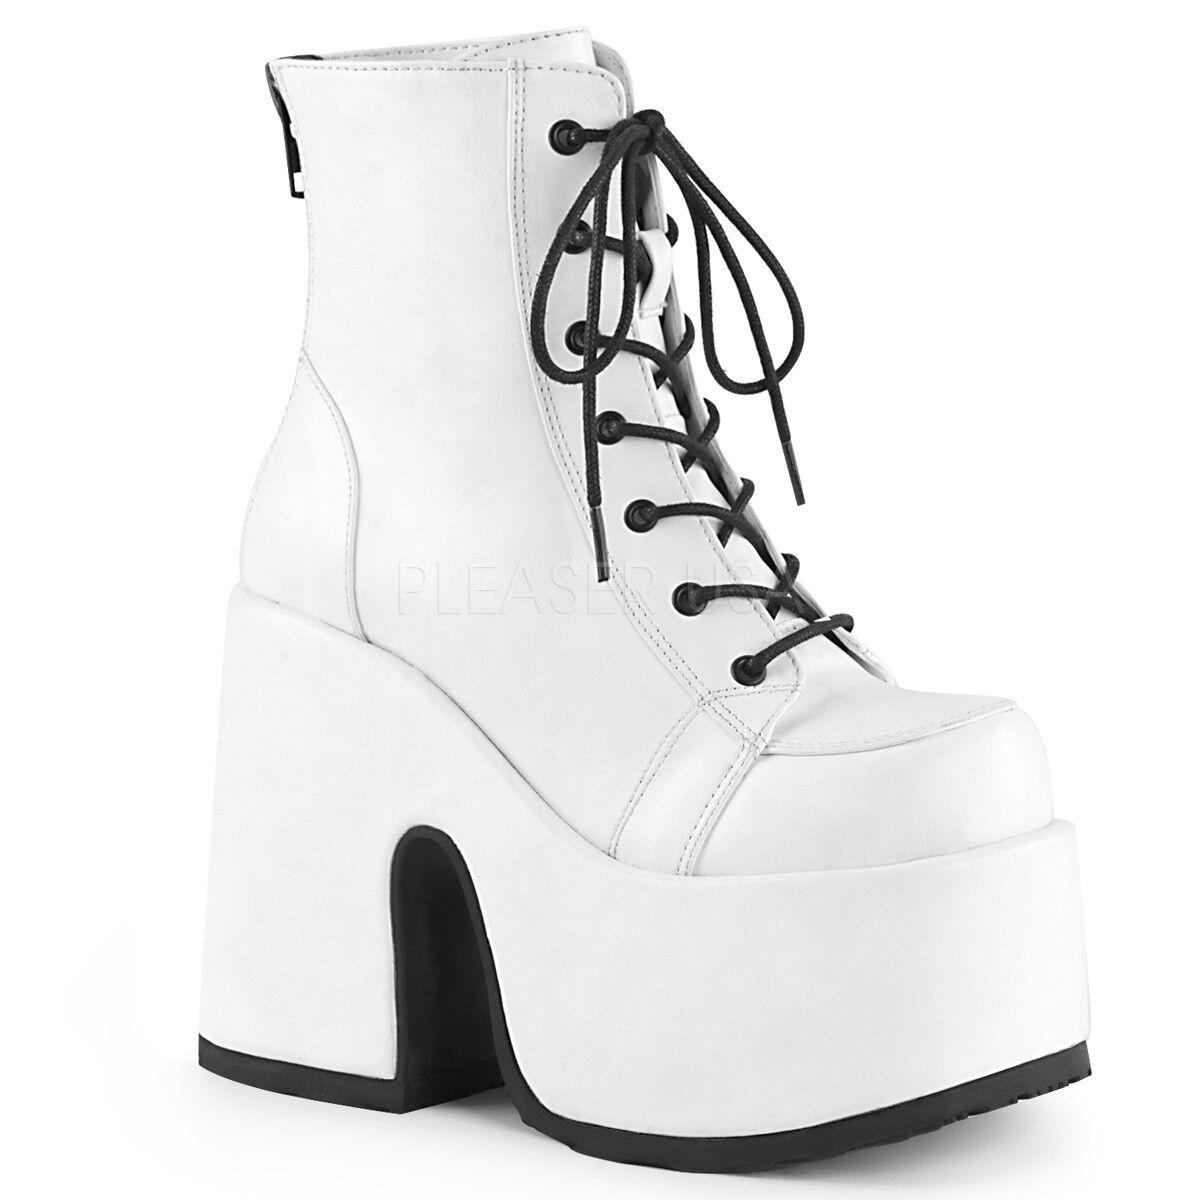 Demonia Camello - 203 Para acordonadas mujeres Cuero blancoo Vegano grueso talón plataforma botas acordonadas Para 798e0c